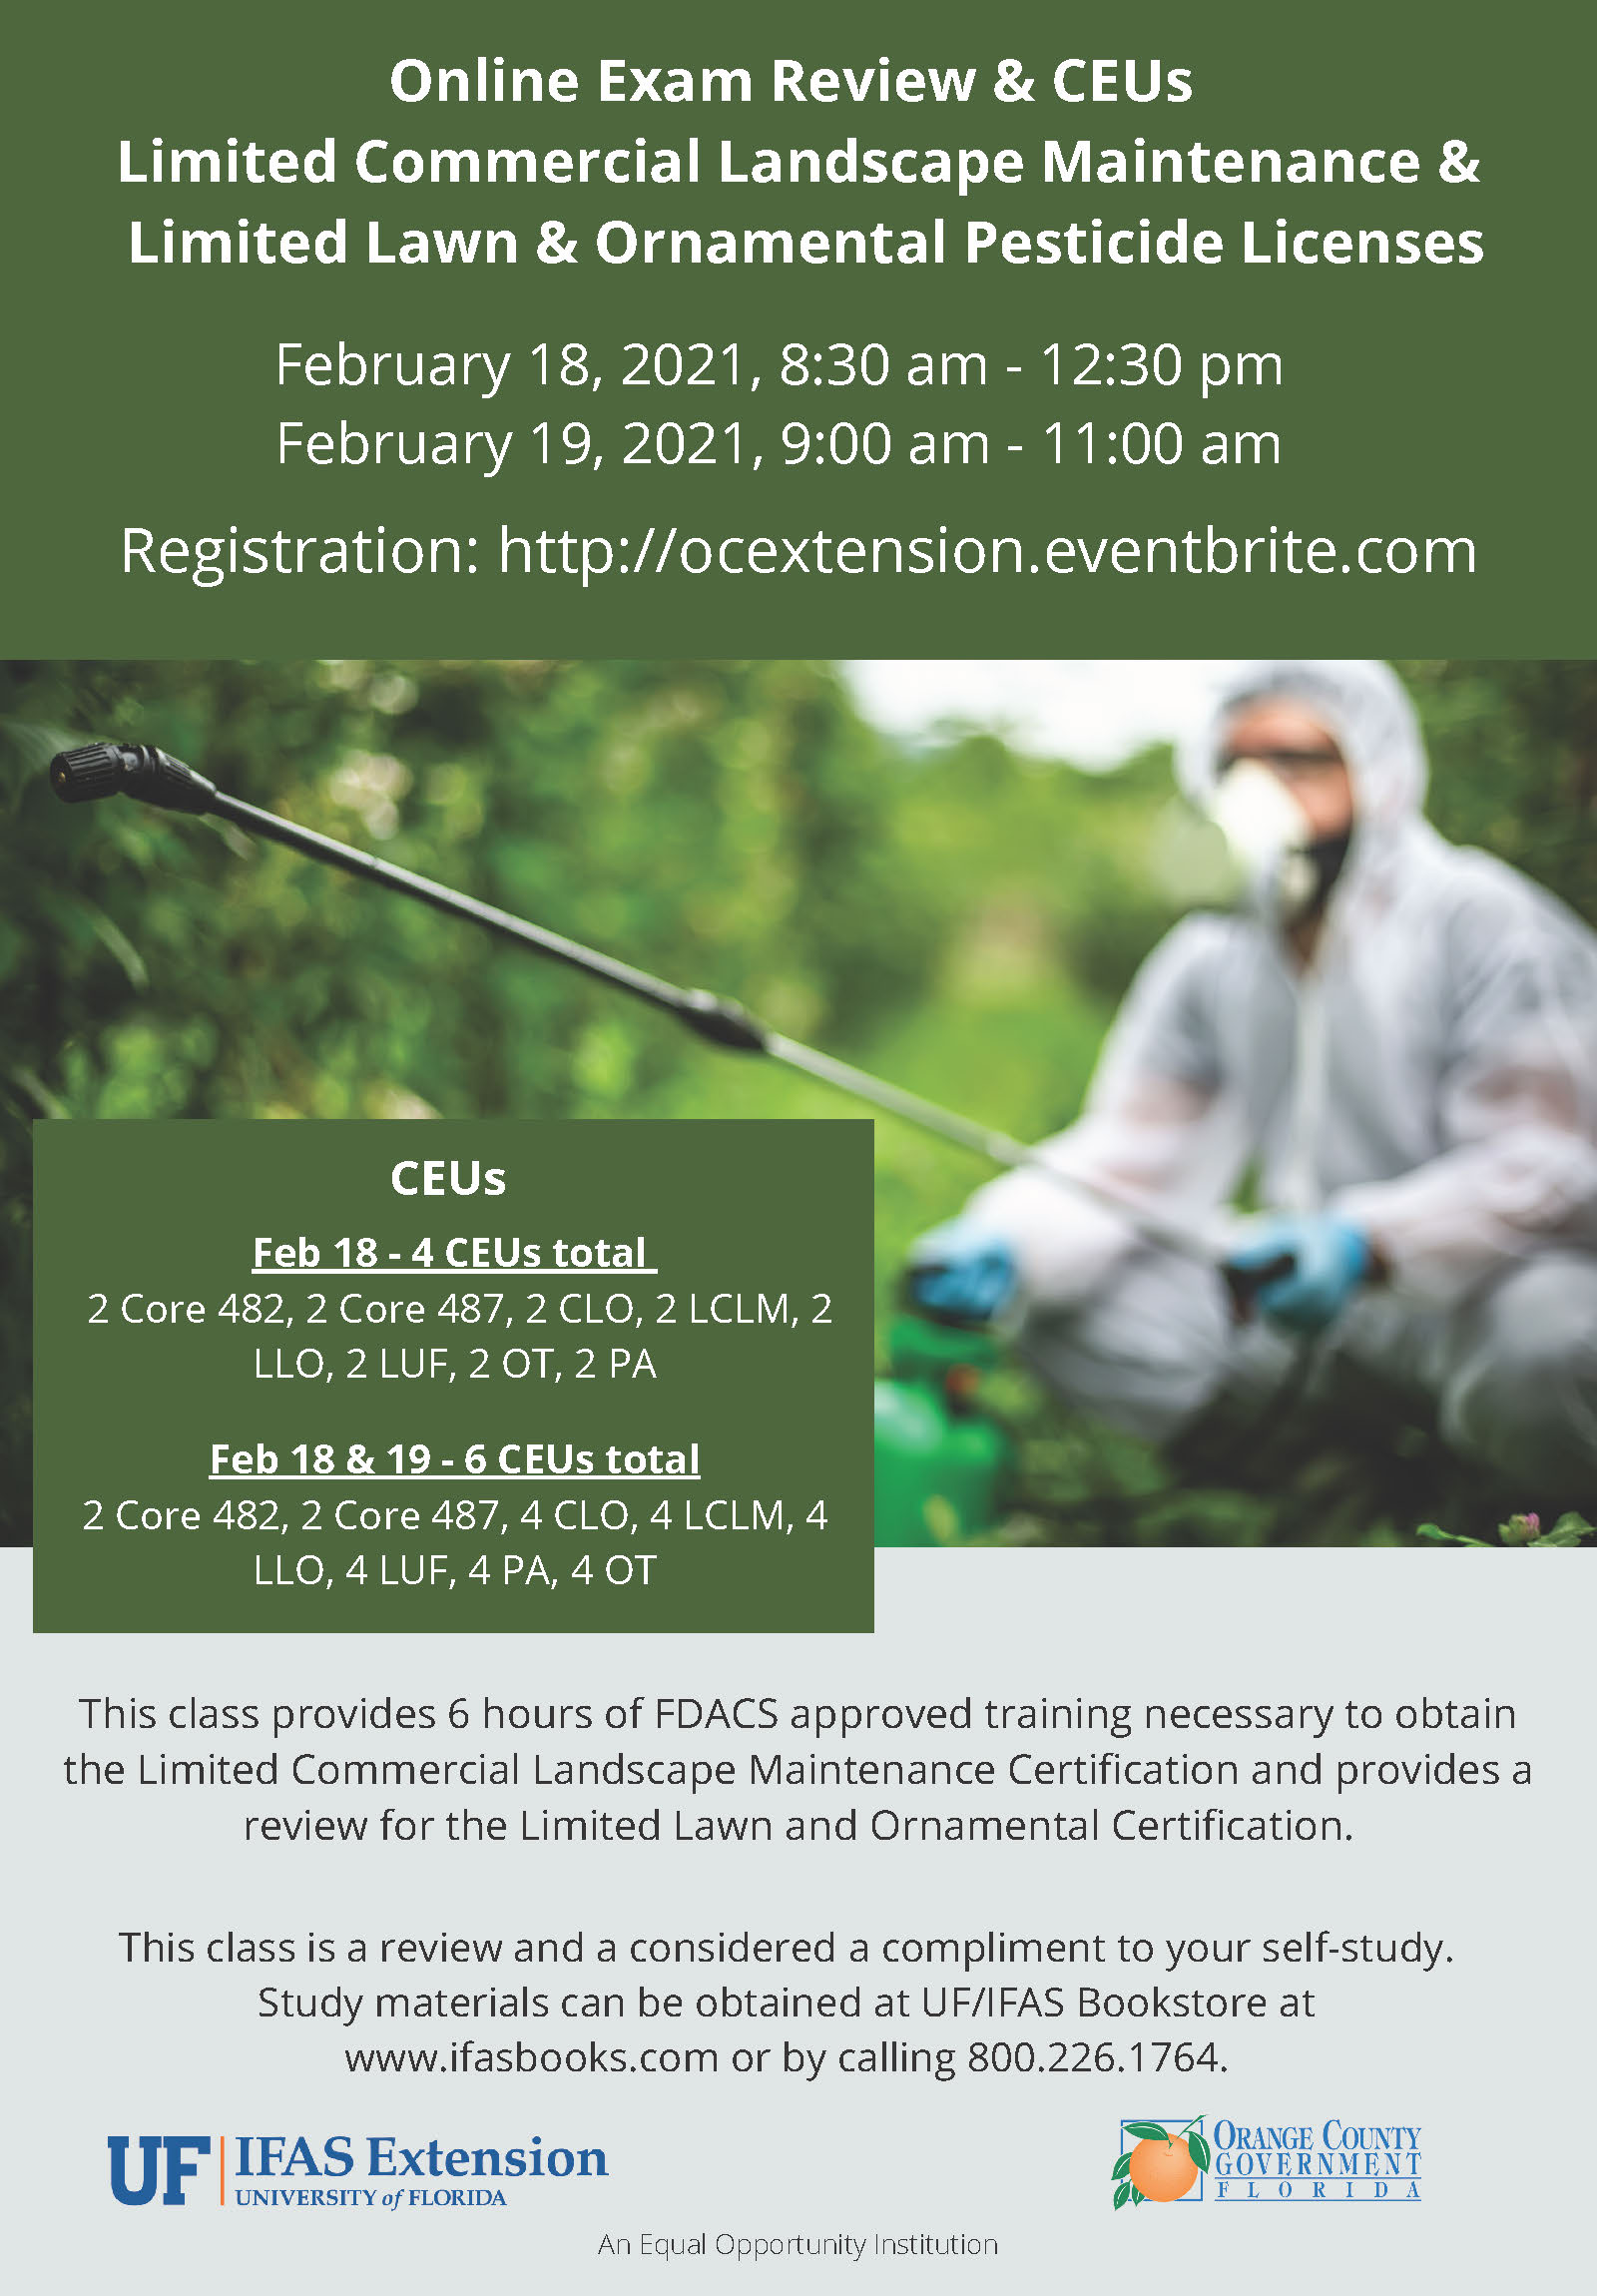 Flyer for Ltd Commercial Landscape Maintenance & Ltd Lawn & Ornamental Pesticide Licenses